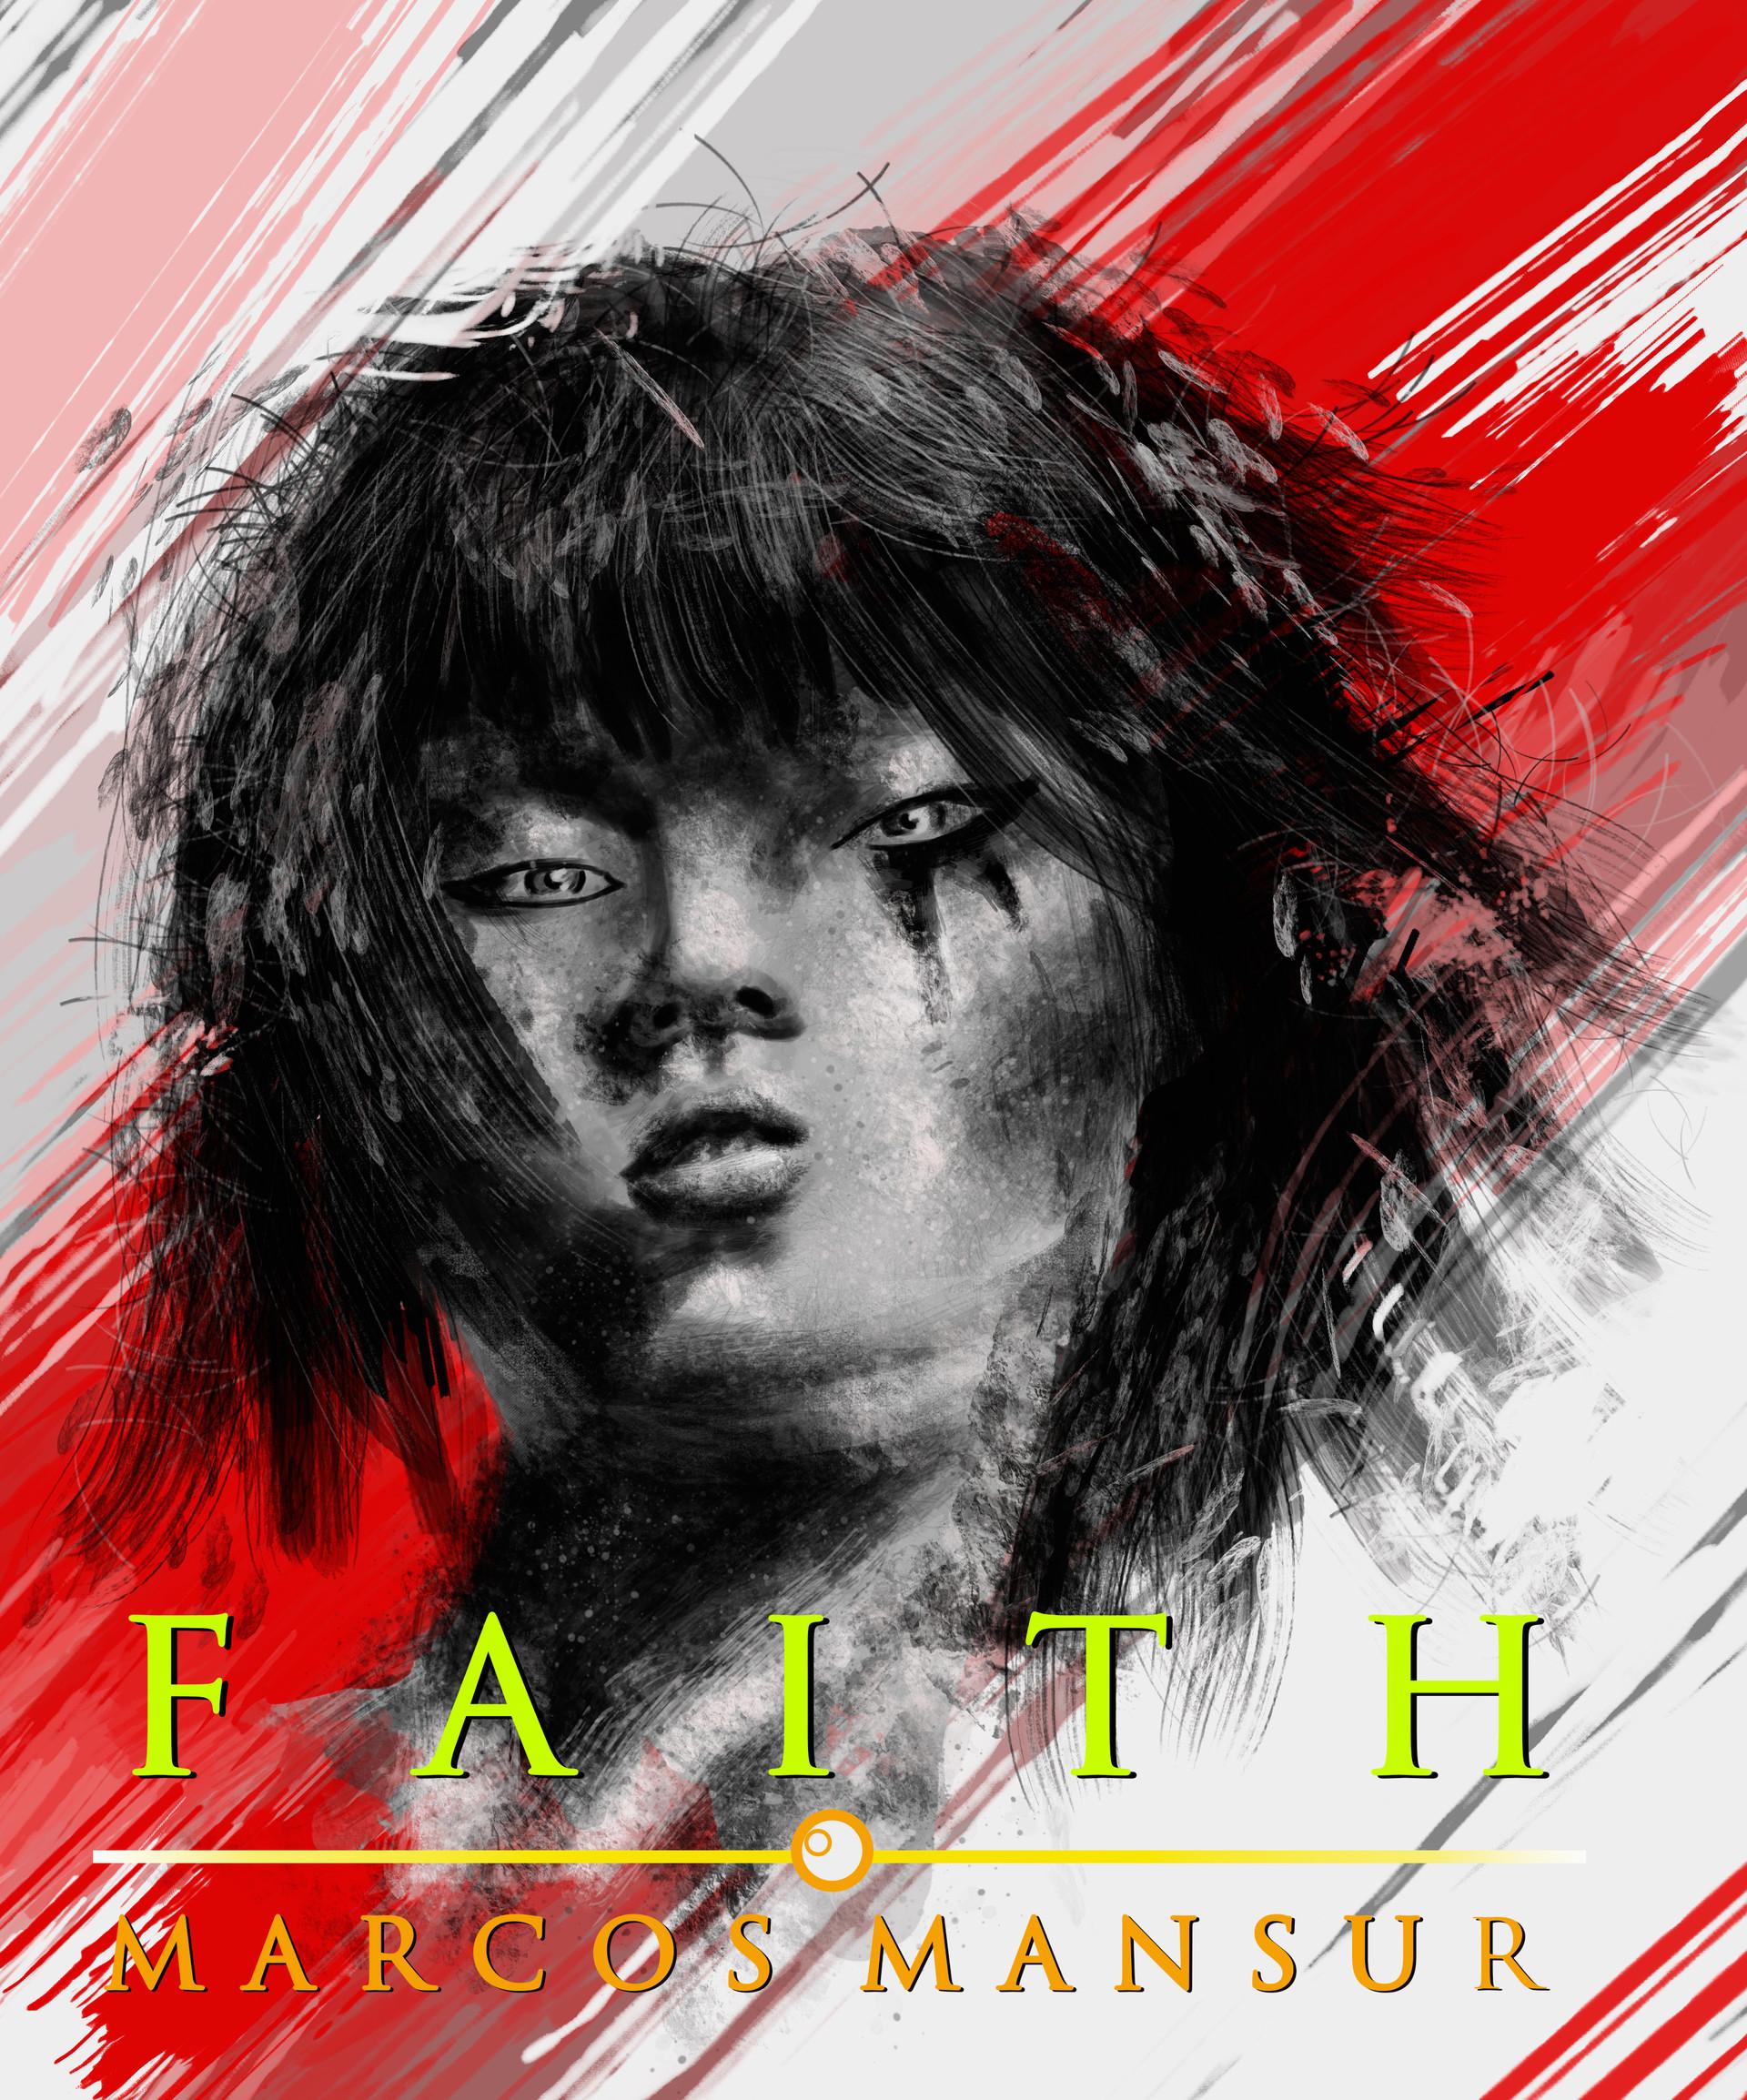 Marcos mansur faith